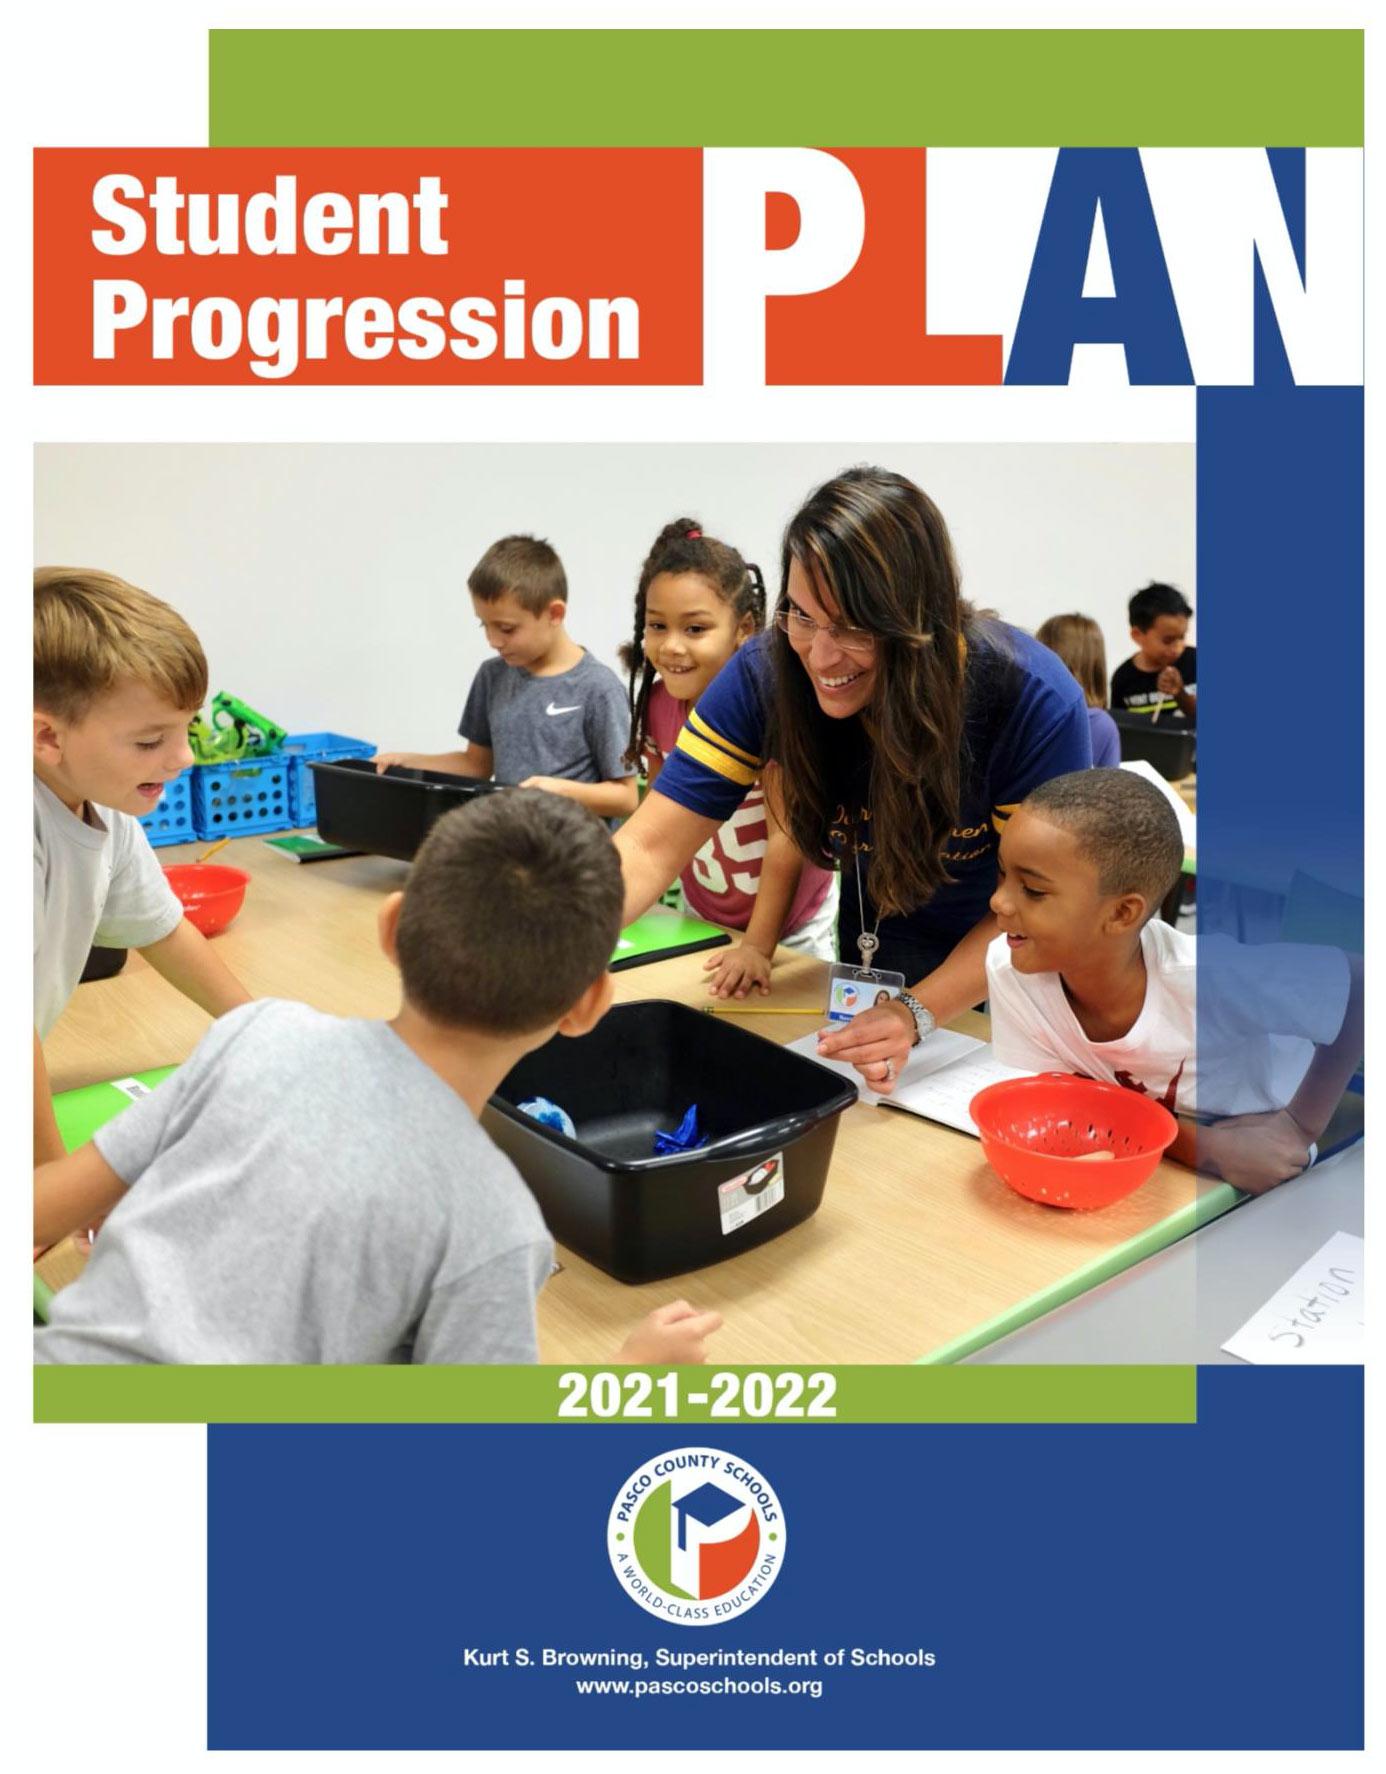 Student Progression Plan 2021-2022